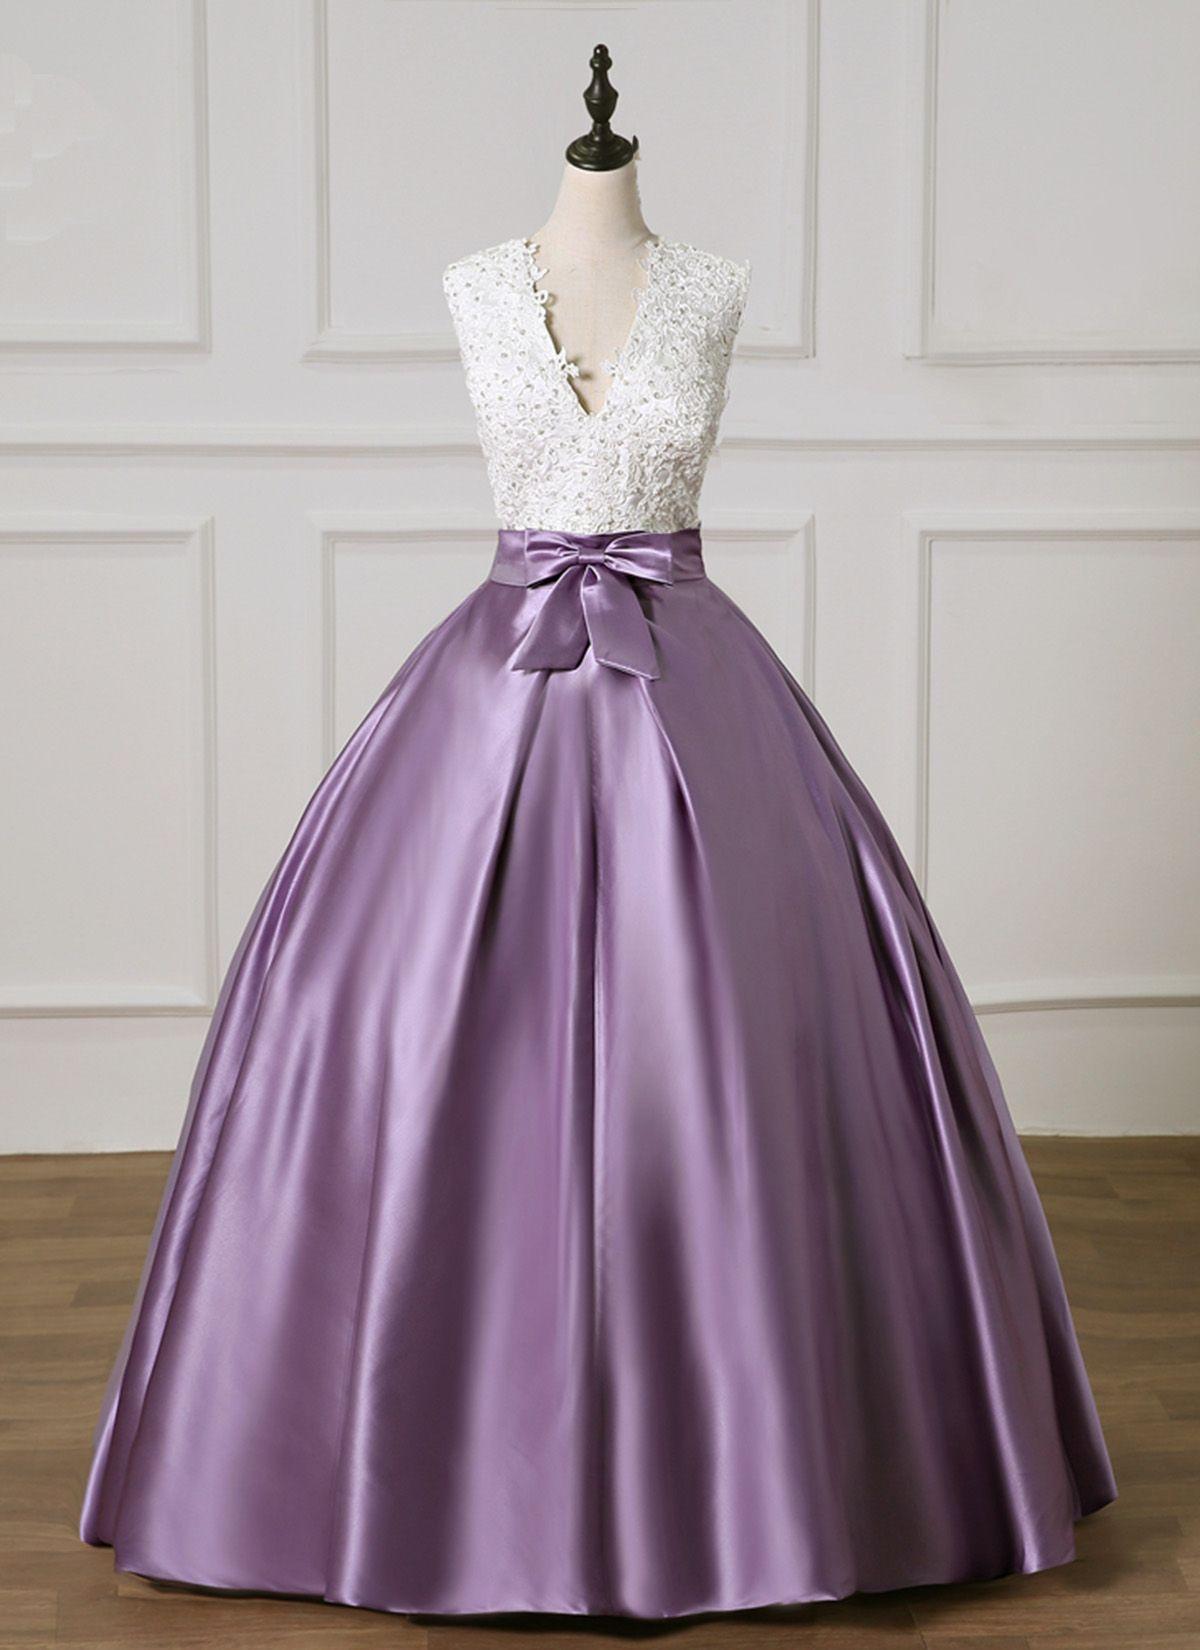 Light Purple Satin White Lace V Neck Long Prom Dress Bridal Dress Promdress Prom Dress Purple Wedding Dress A Line Wedding Dress Princess Outfits [ 1650 x 1200 Pixel ]